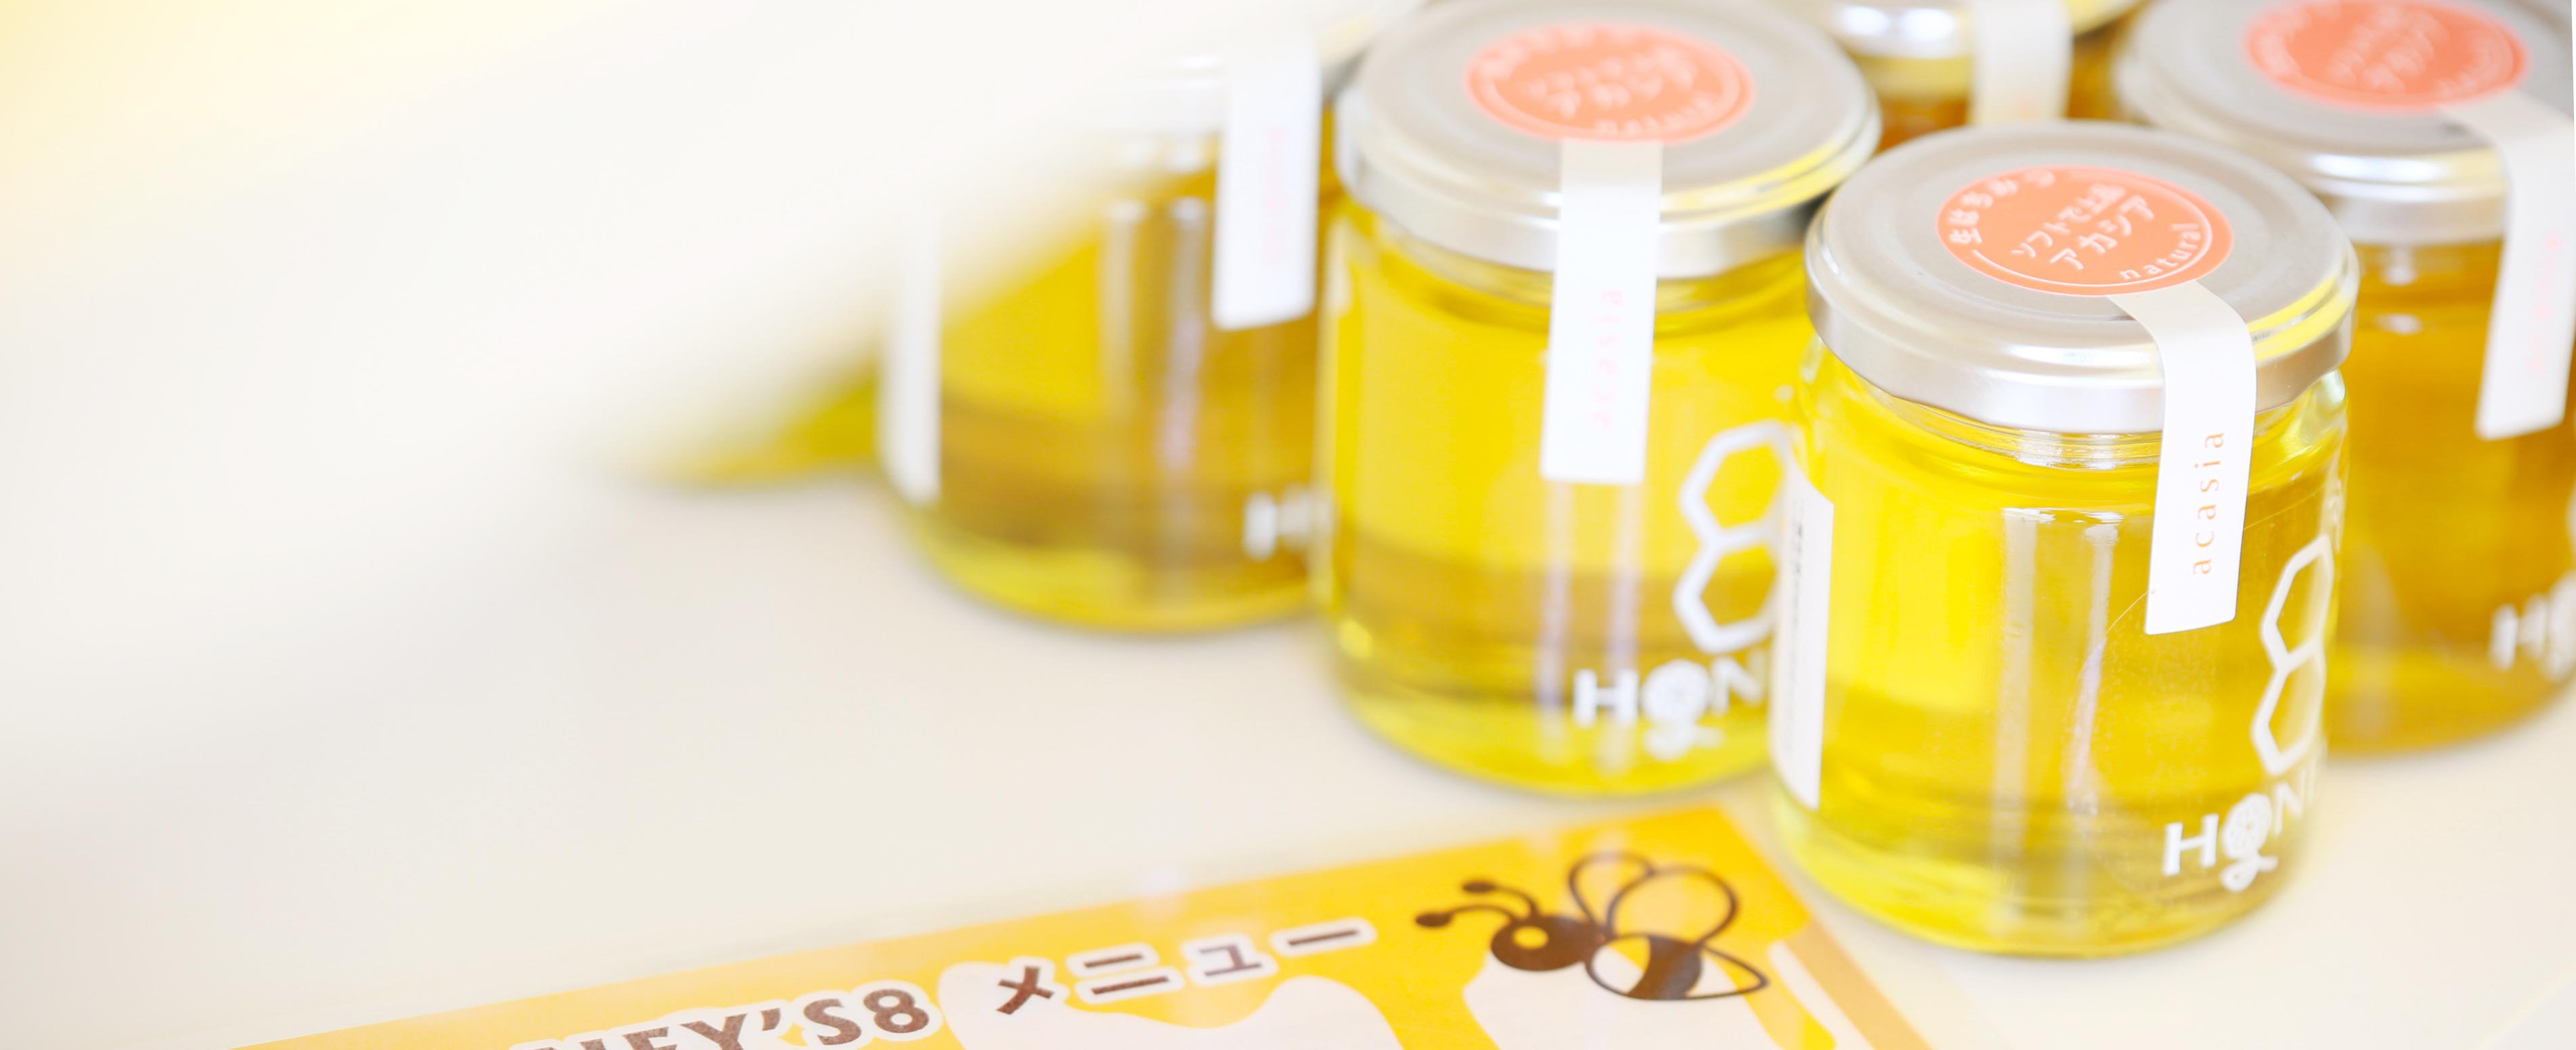 HONEY'S8(ハニーズ8)はちみつ専門店|阿久比町|ギフト|通販|お問い合わせ